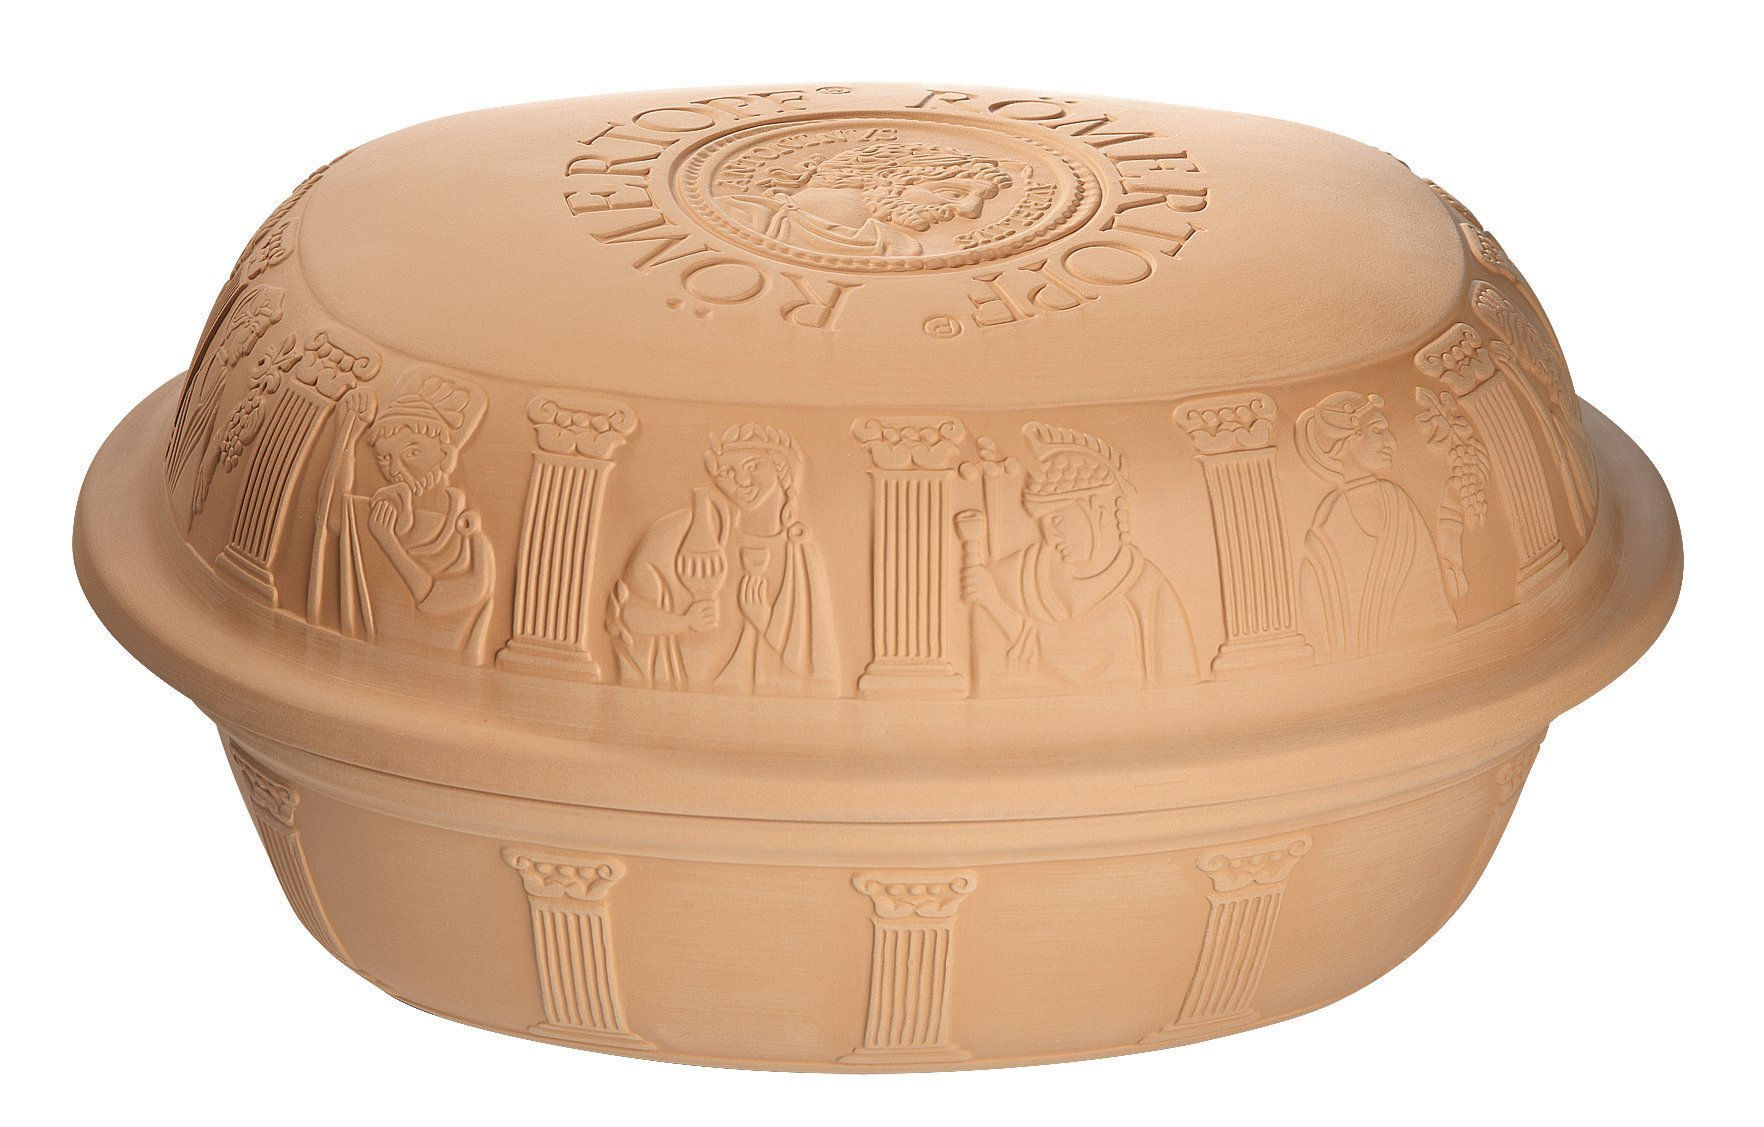 Romertopf Extra Large for Turkey Glazed Clay Roaster, 7.3 quart, Terracotta